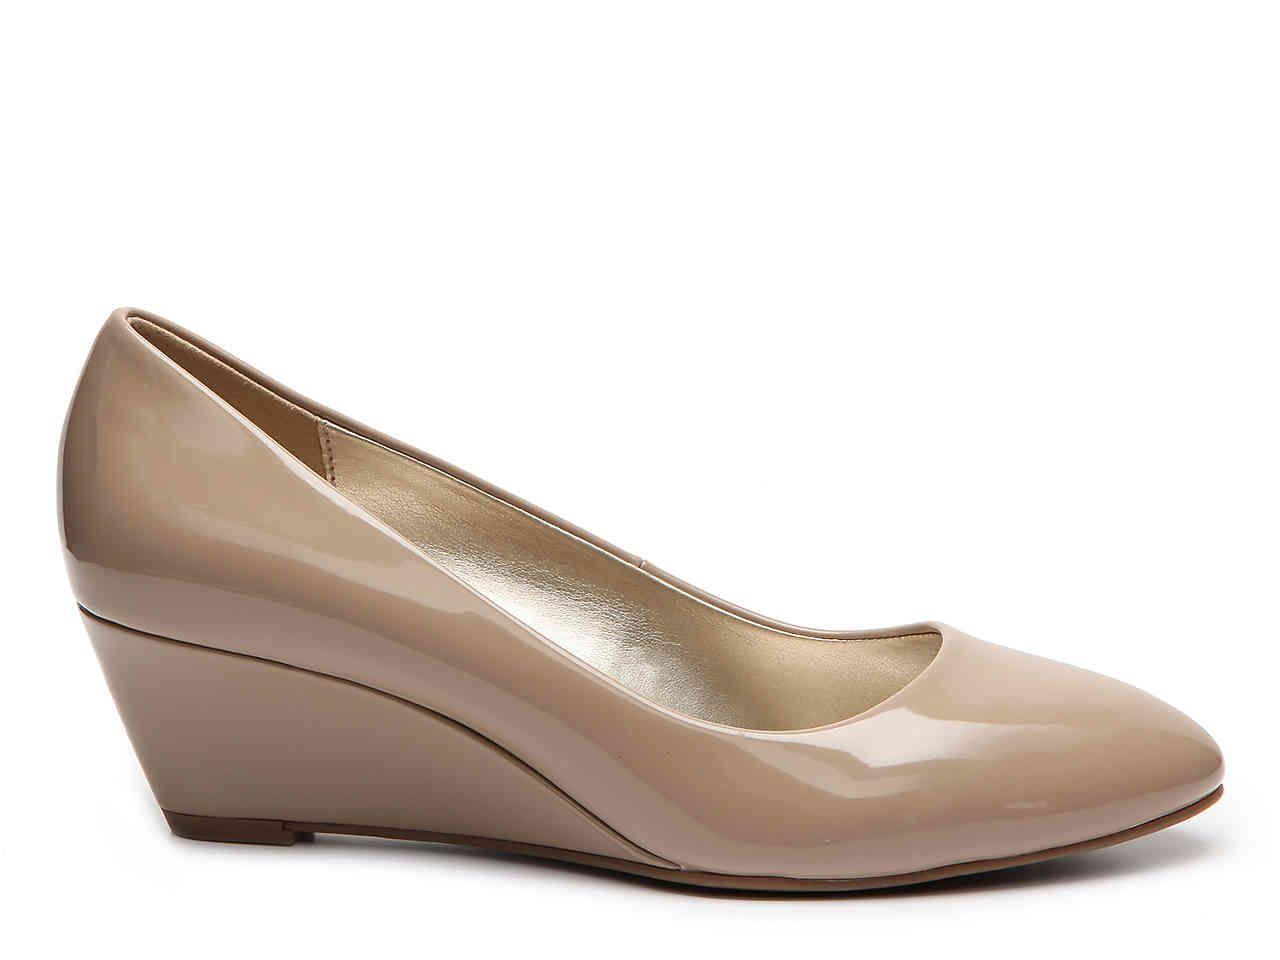 c688cf8ccfd Bandolino Franci Wedge Pump Women s Shoes